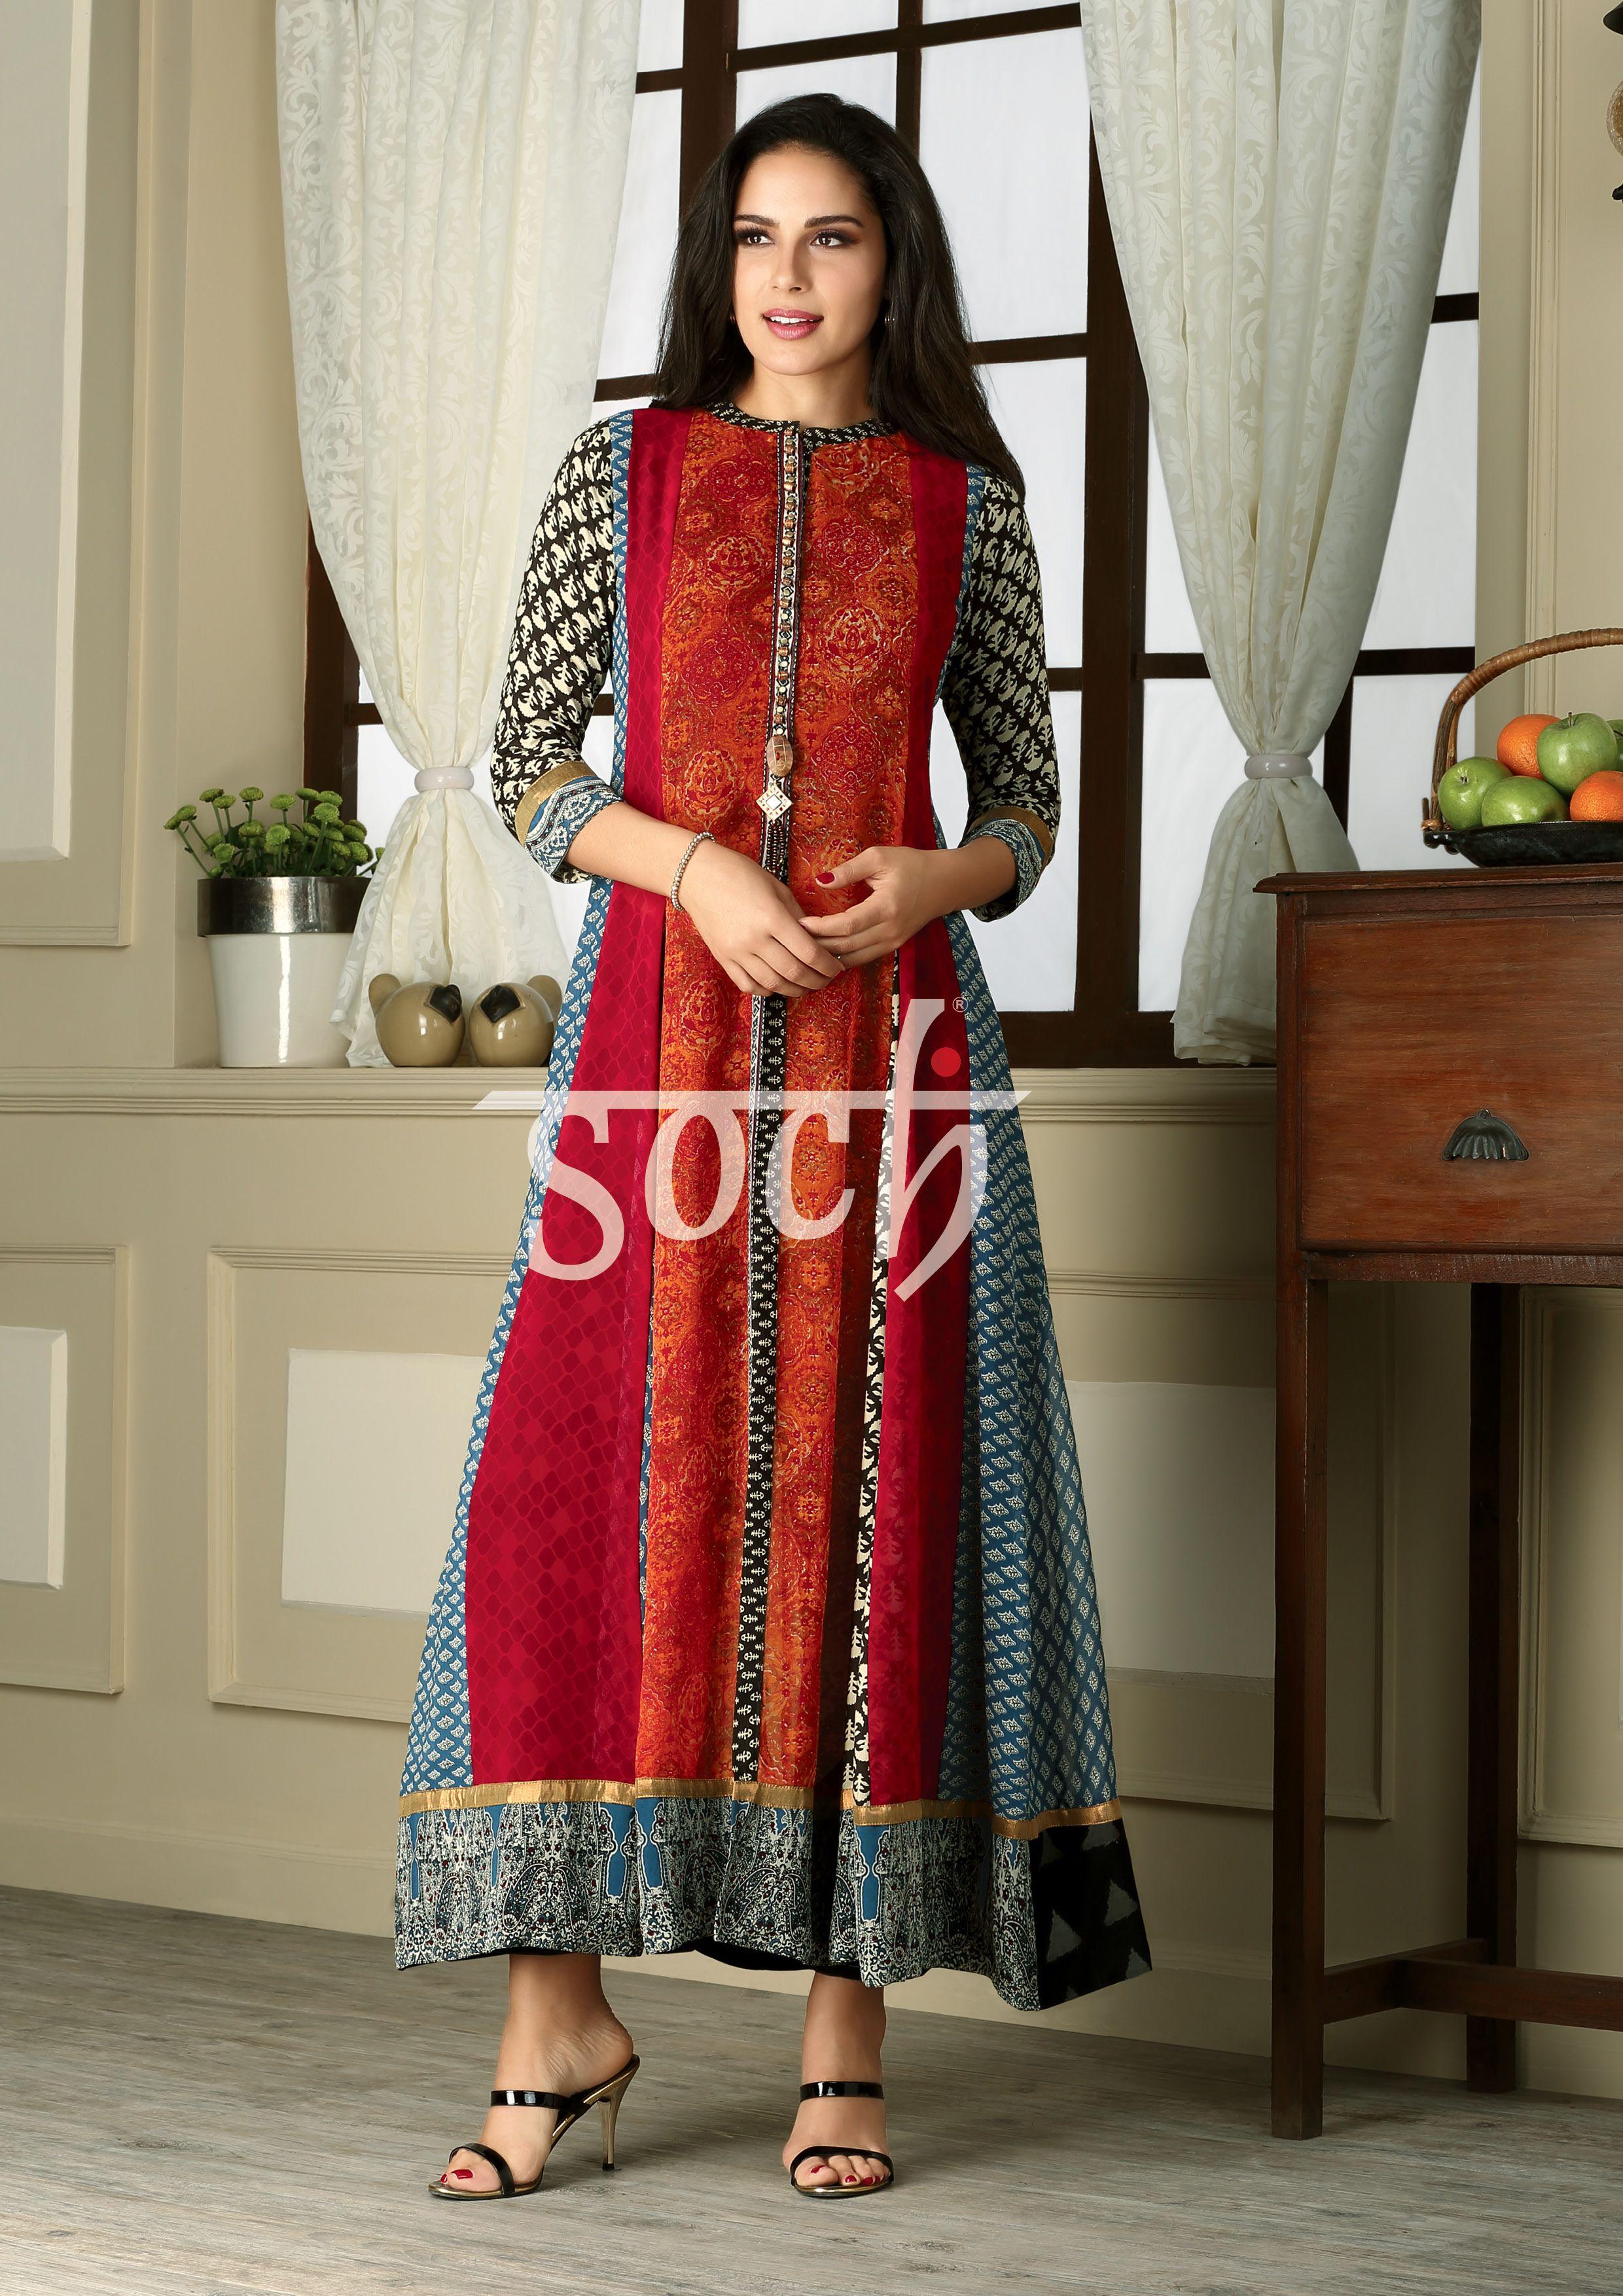 af2d6fa68c Long Kurtis, Kurti Patterns, Daisy Dress, Ethnic Fashion, Indian Fashion,  Indian. Visit. January 2019